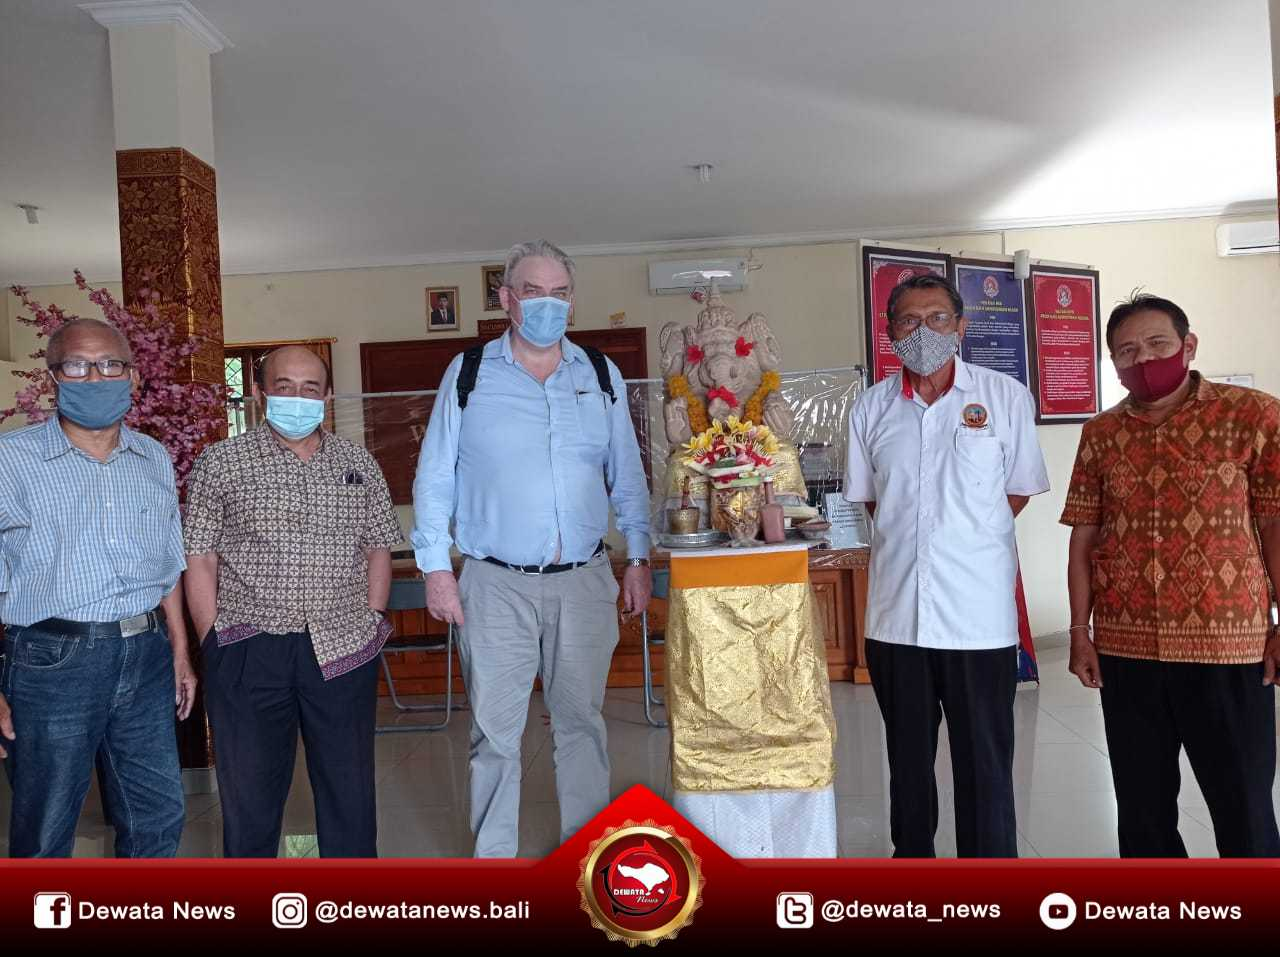 Prof. Simon Field (tengah) saat berkunjung ke STISPOL Wira Bhakti dan diterima Ketua STISPOL Wira Bhakti, Prof. Dr. Wayan Windia, SU (nomor 2 dari kanan) dan jajarannya